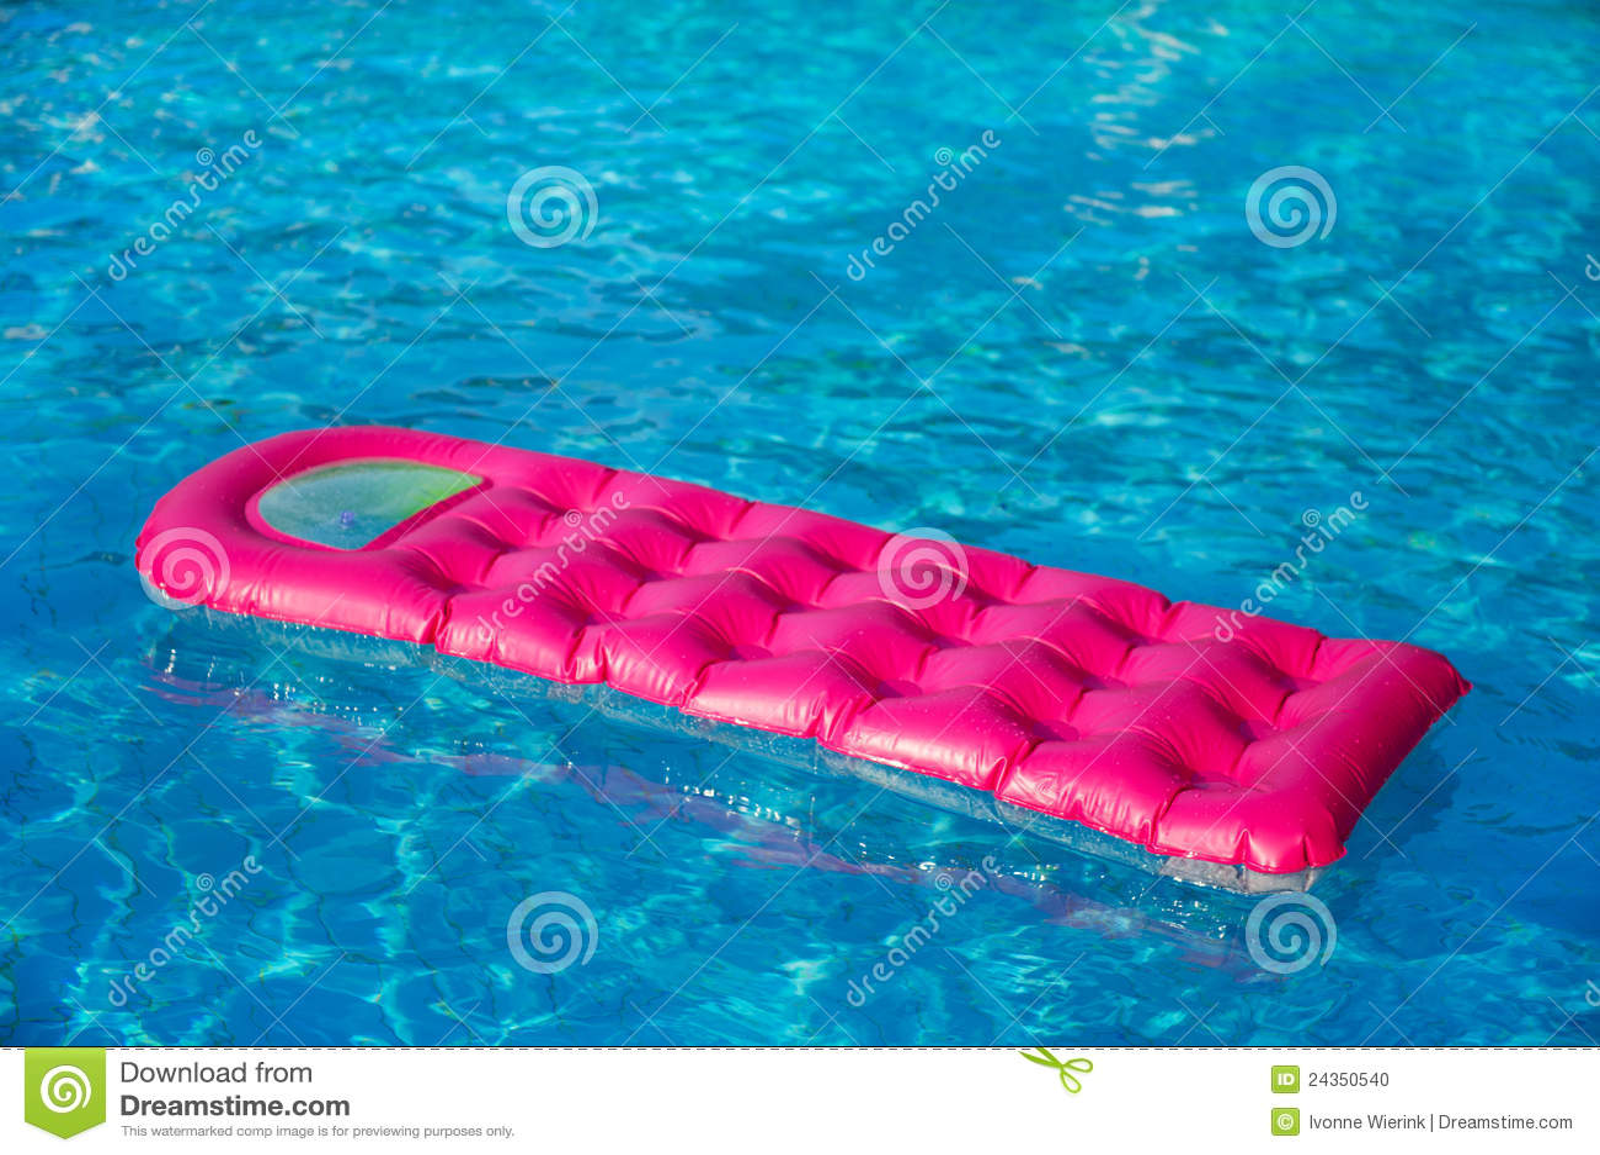 Floating Air Mattress Stock Photo Image 24350540